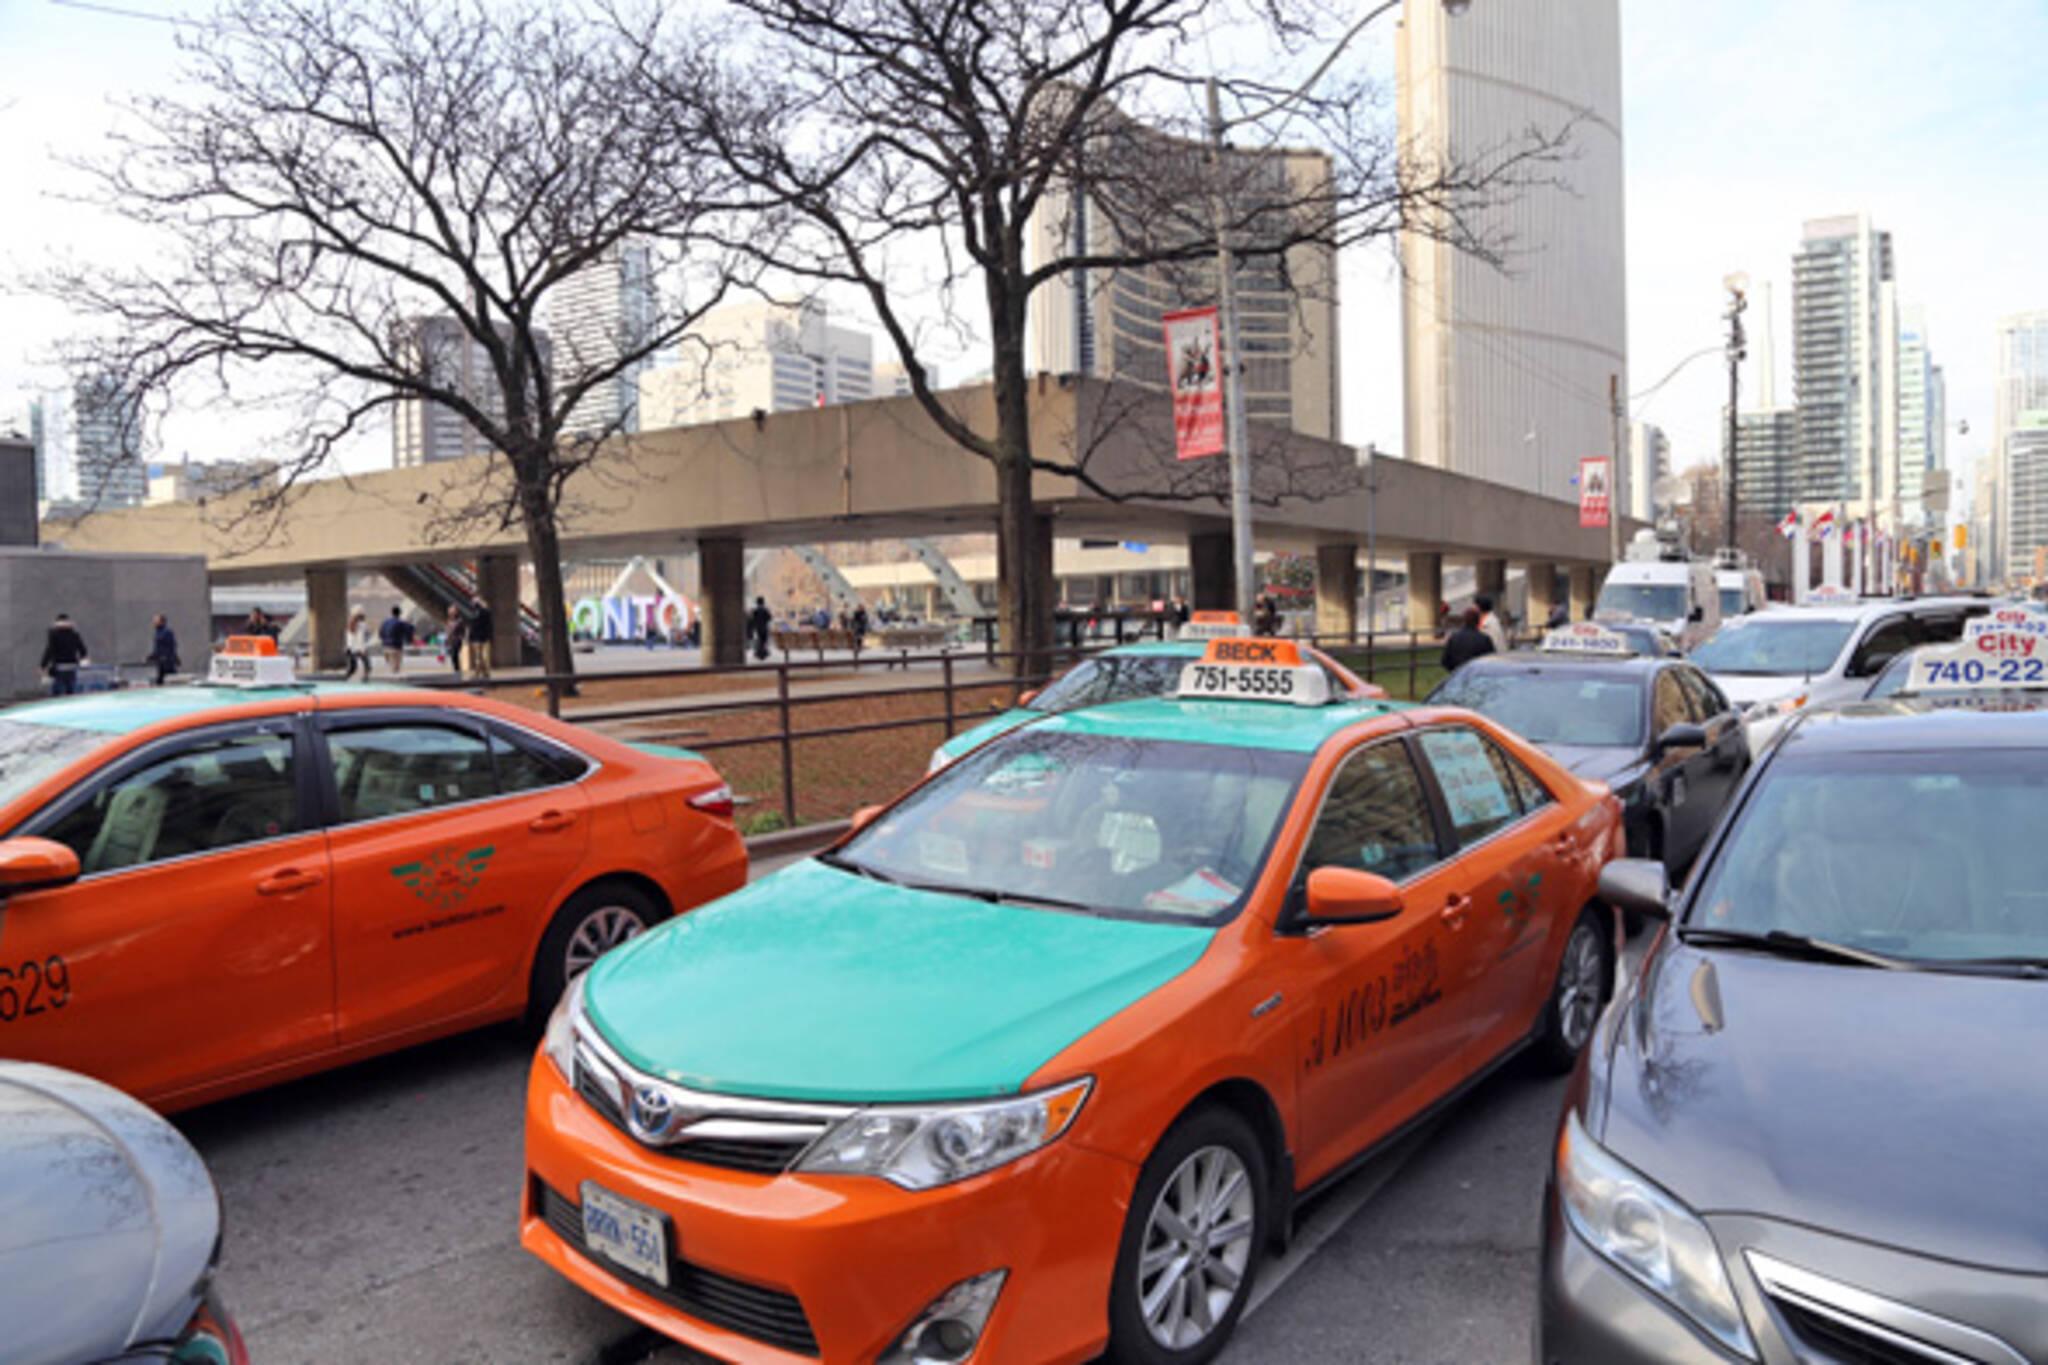 Beck taxi protest Toronto